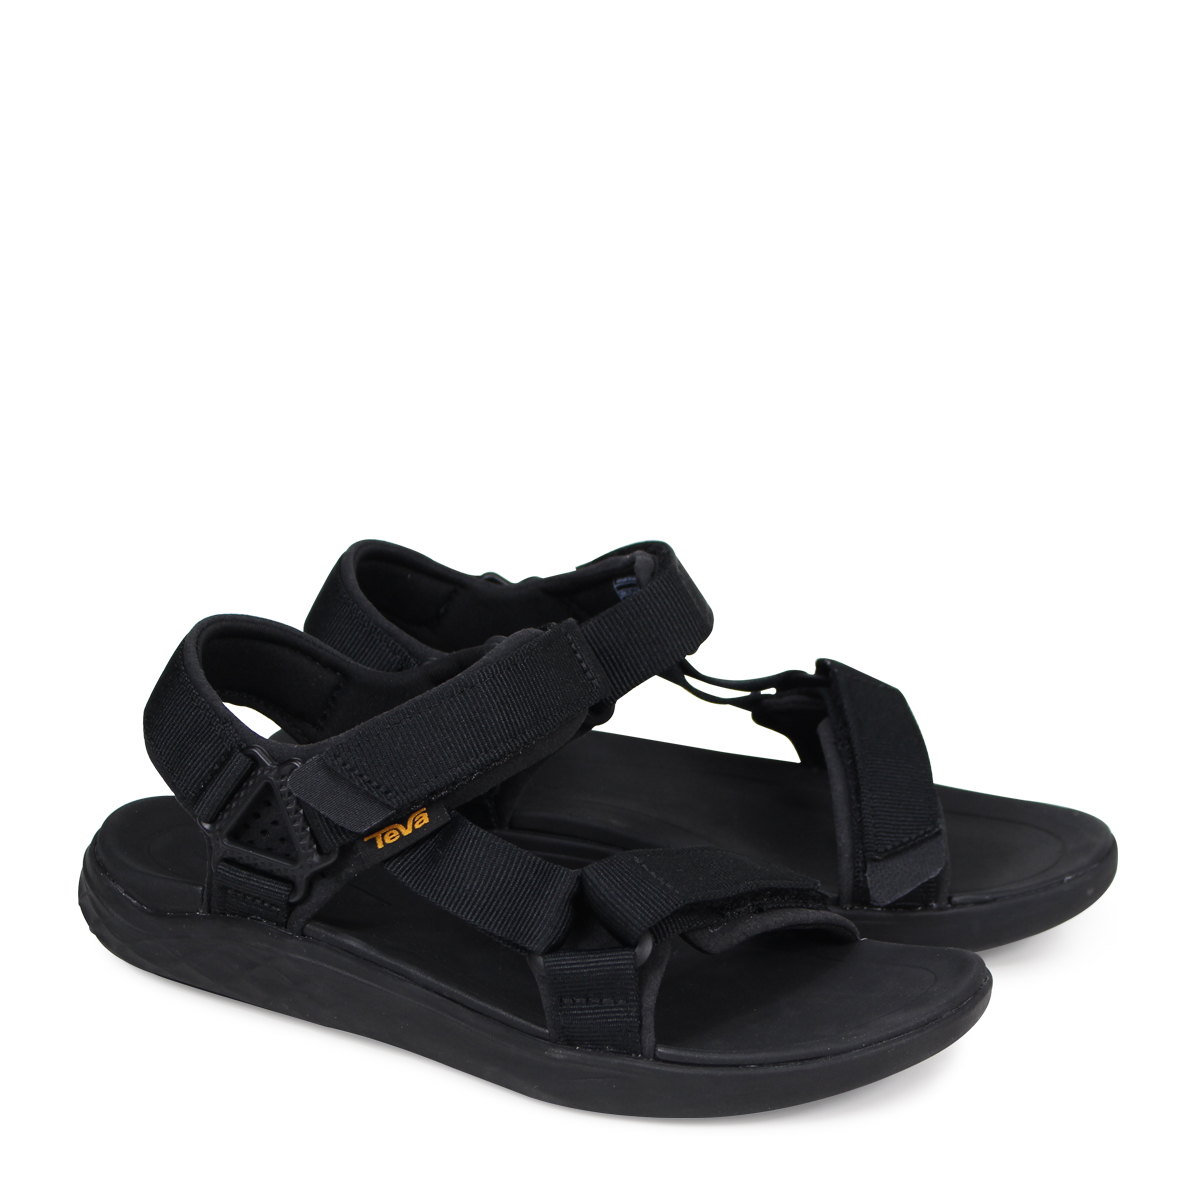 a1170f037 ALLSPORTS  Teva TERRA-FLOAT 2 UNIVERSAL Teva sandals Lady s terra ...